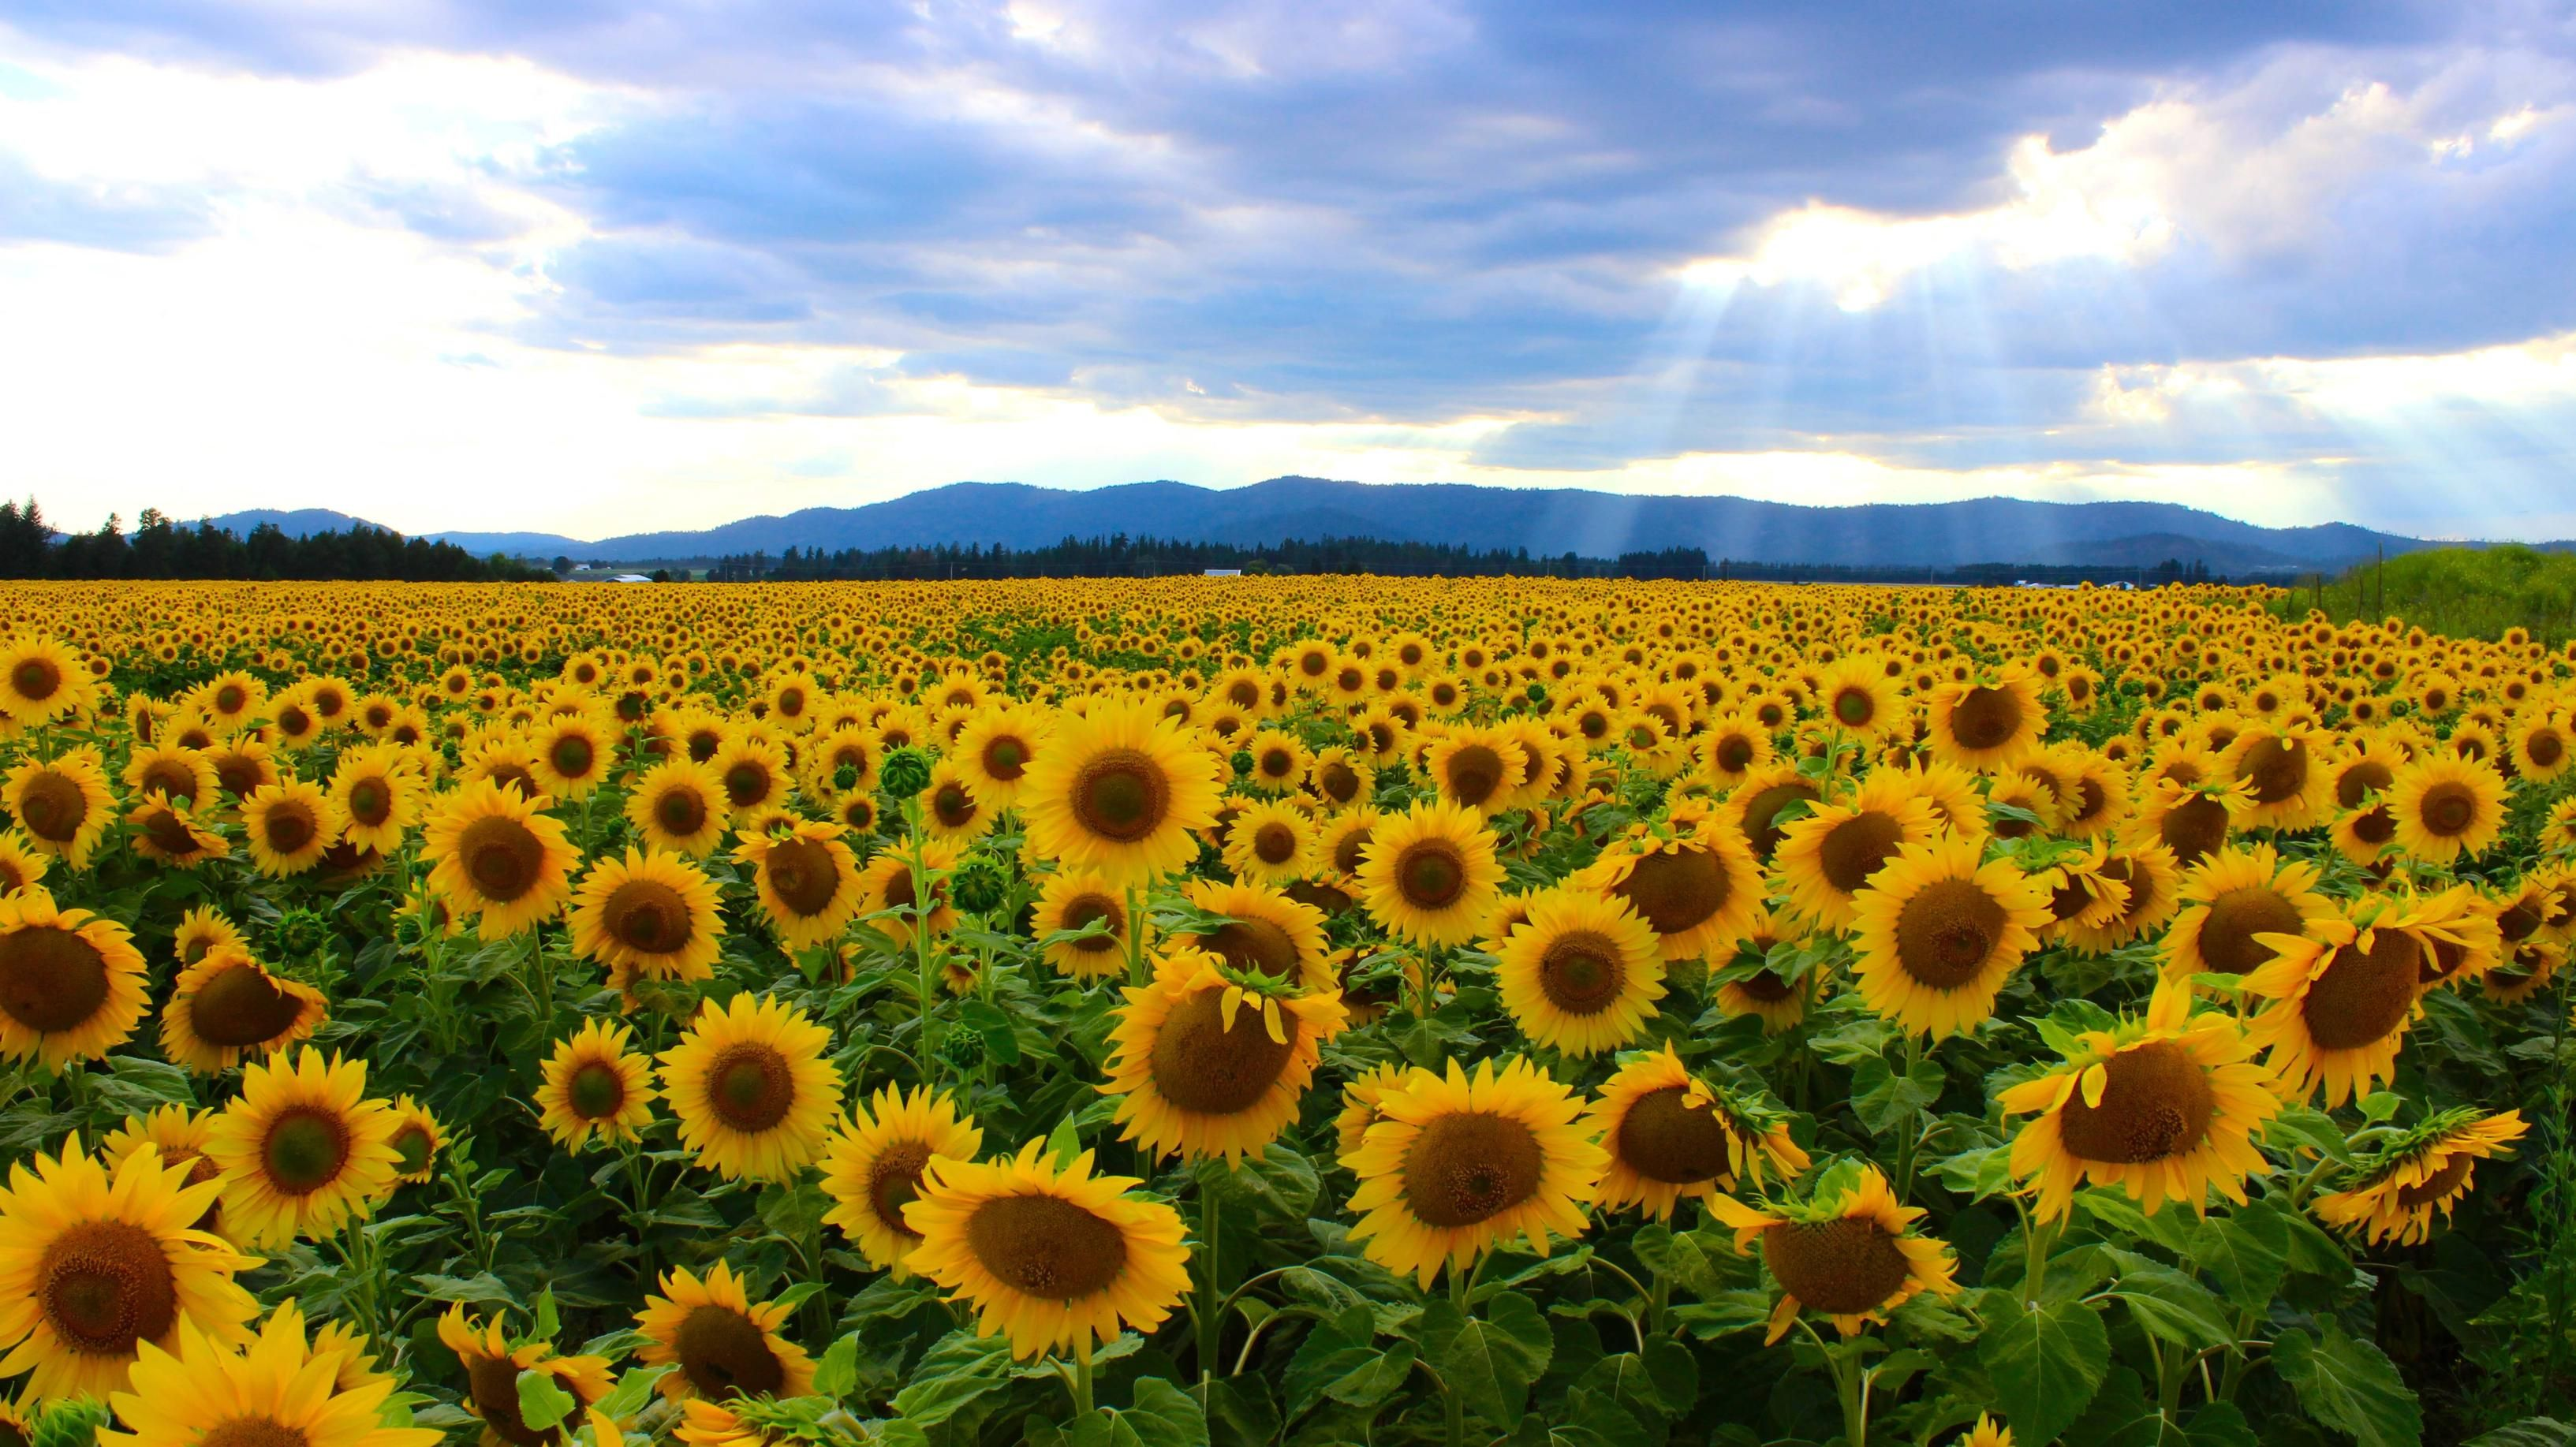 Field of sunflowers (Photo by /u/spockgiirl) [3266 x 1835 ...